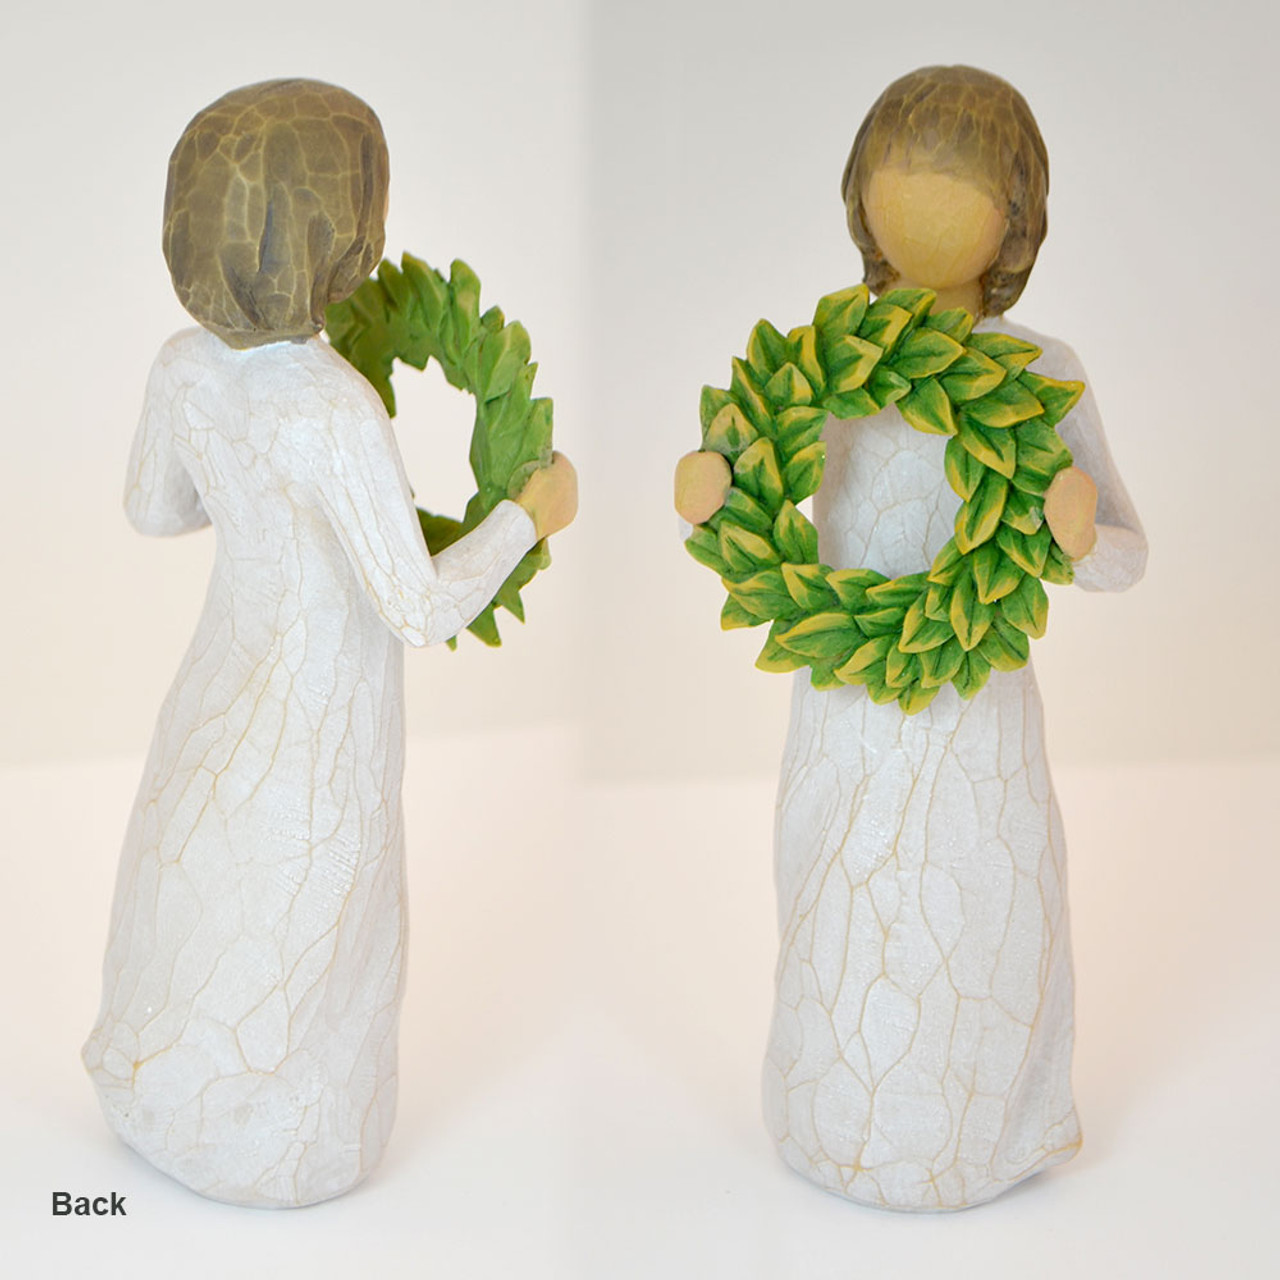 Wreath Figurine Willow Tree